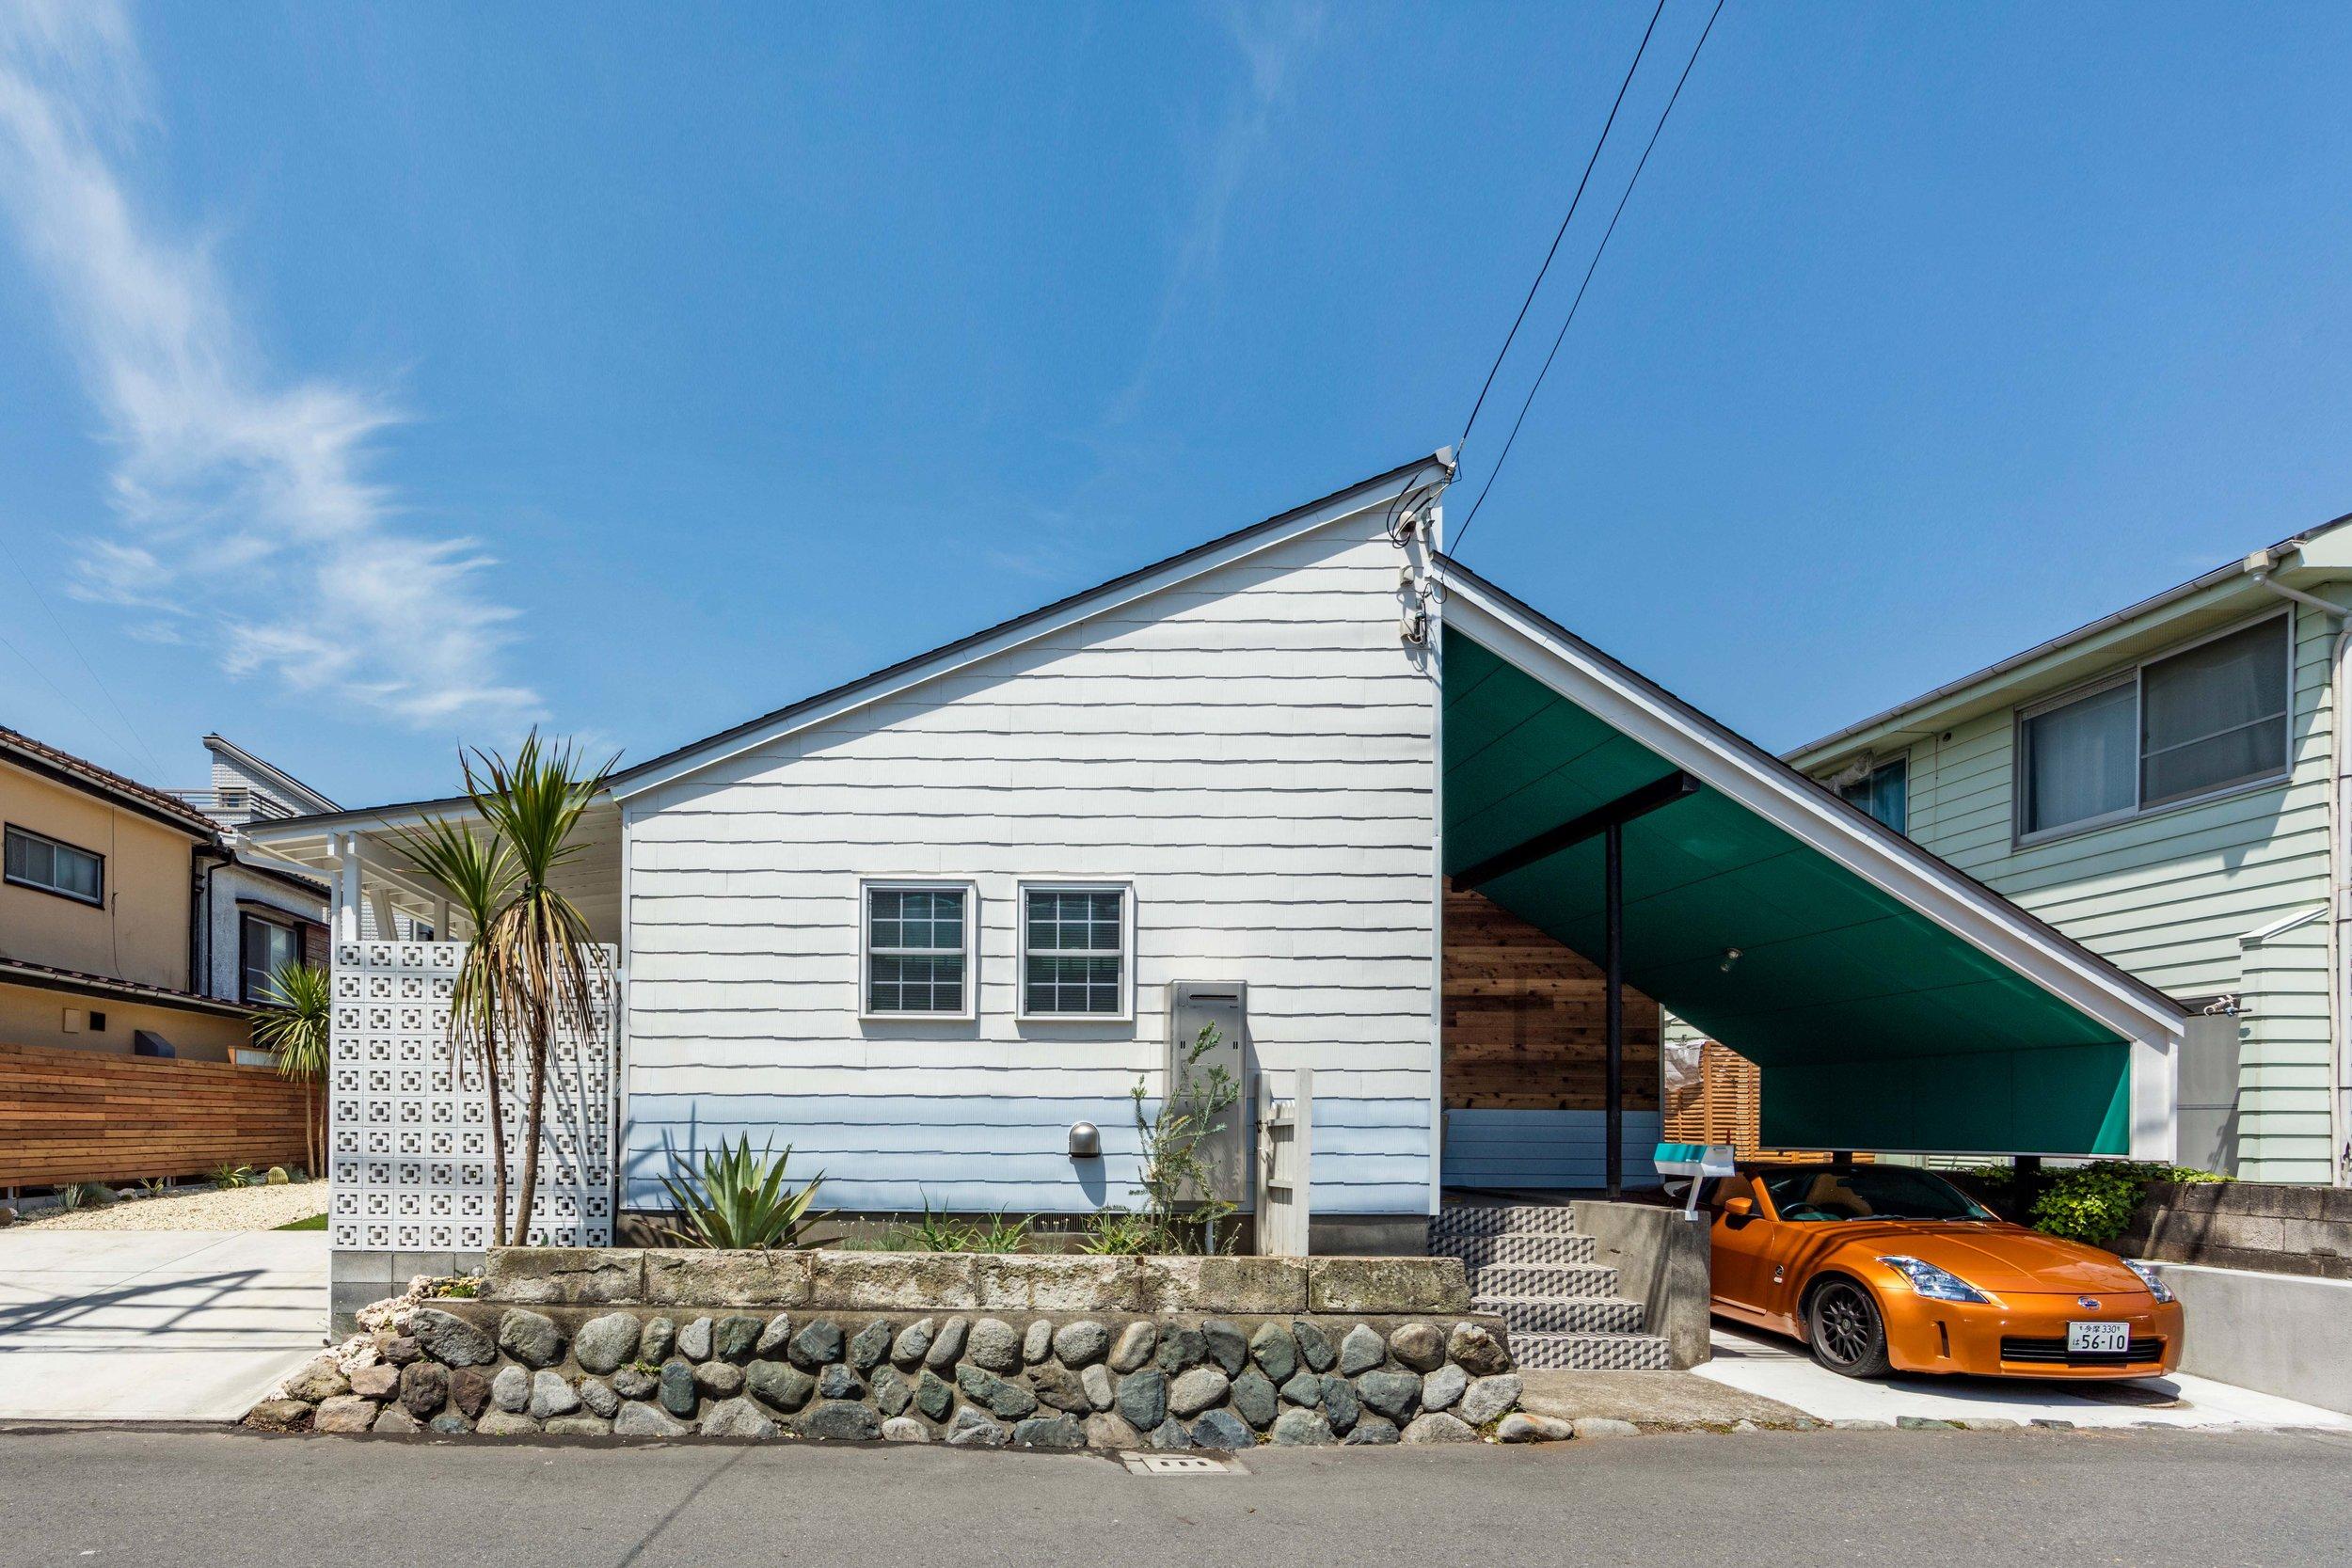 Chigasaki Surf House